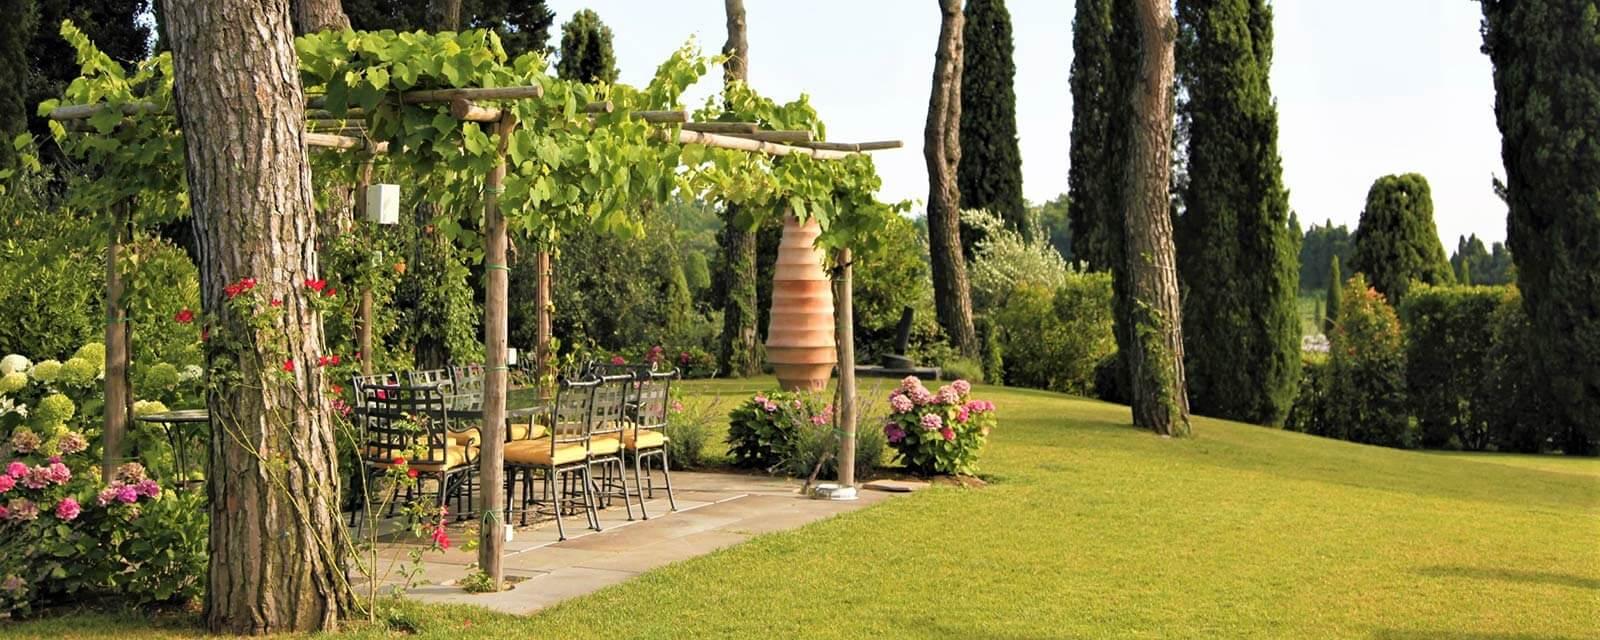 La scuderia exklusives ferienhaus in der toskana bei lucca zur miete - Toskana garten ...